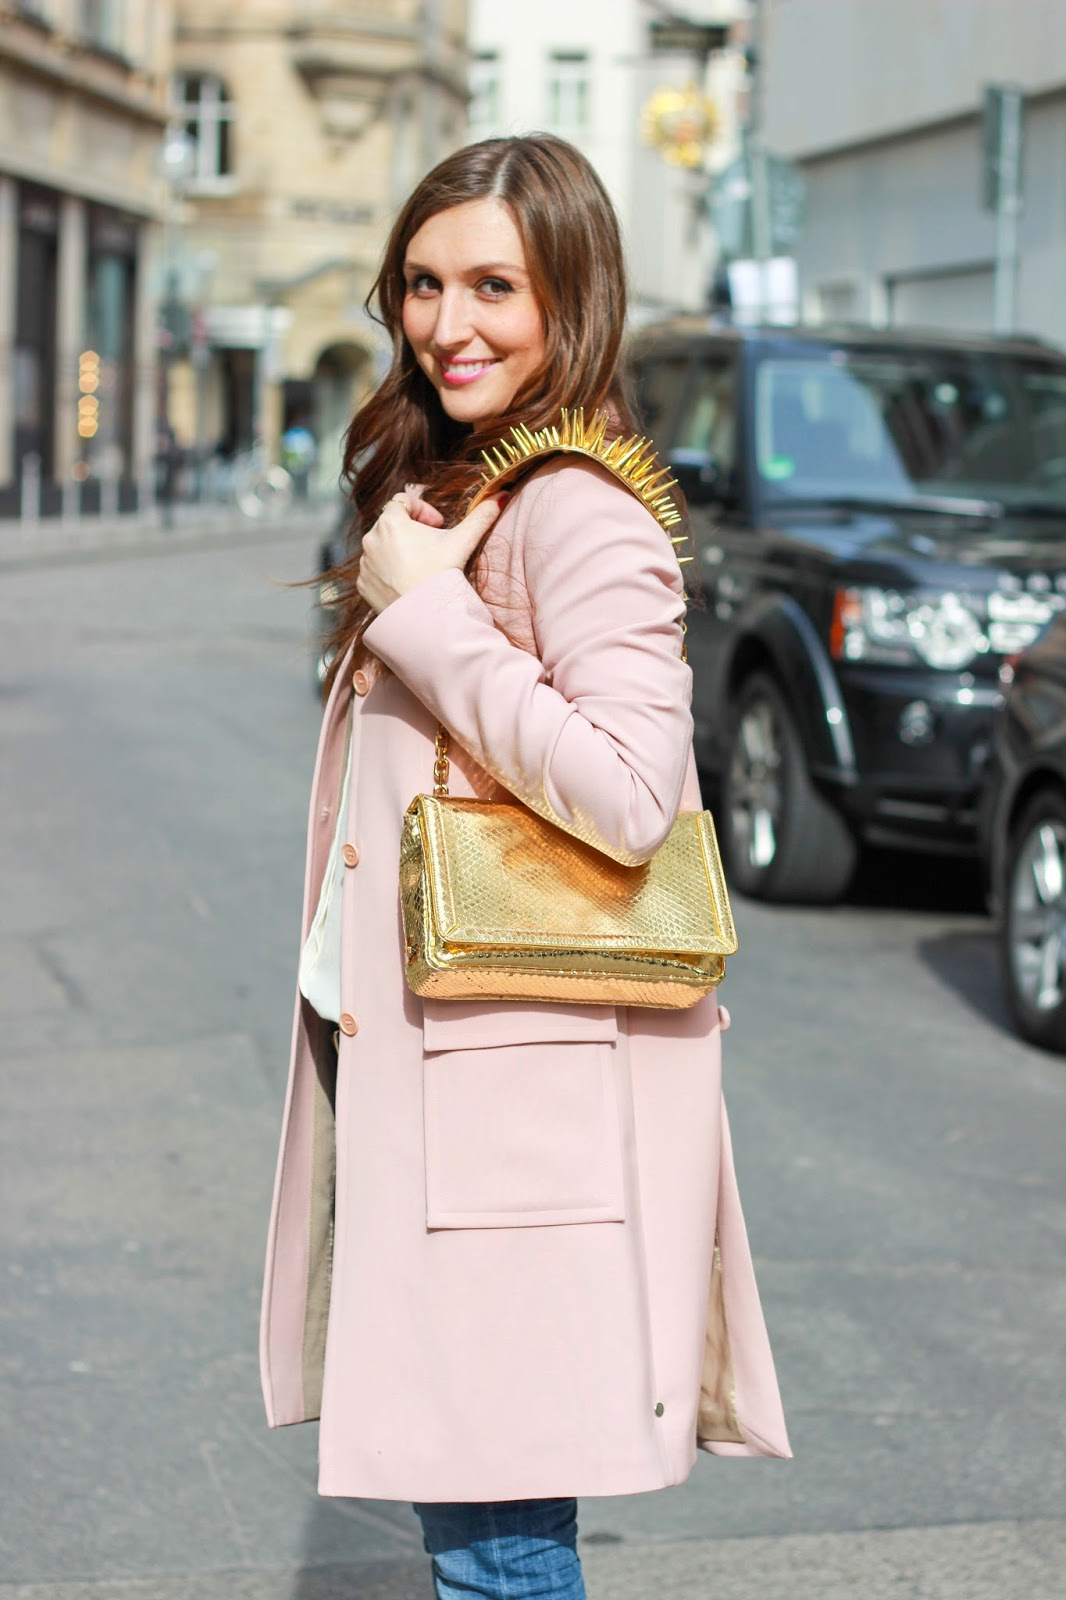 Streetstylellook - Rosa Mantel - YSL Mantel - Goldene Tasche kombinieren - Deutsche Fashionblogger - Fashionblogger aus Frankfurt - Frankfurt Fashionblogger-louboutin